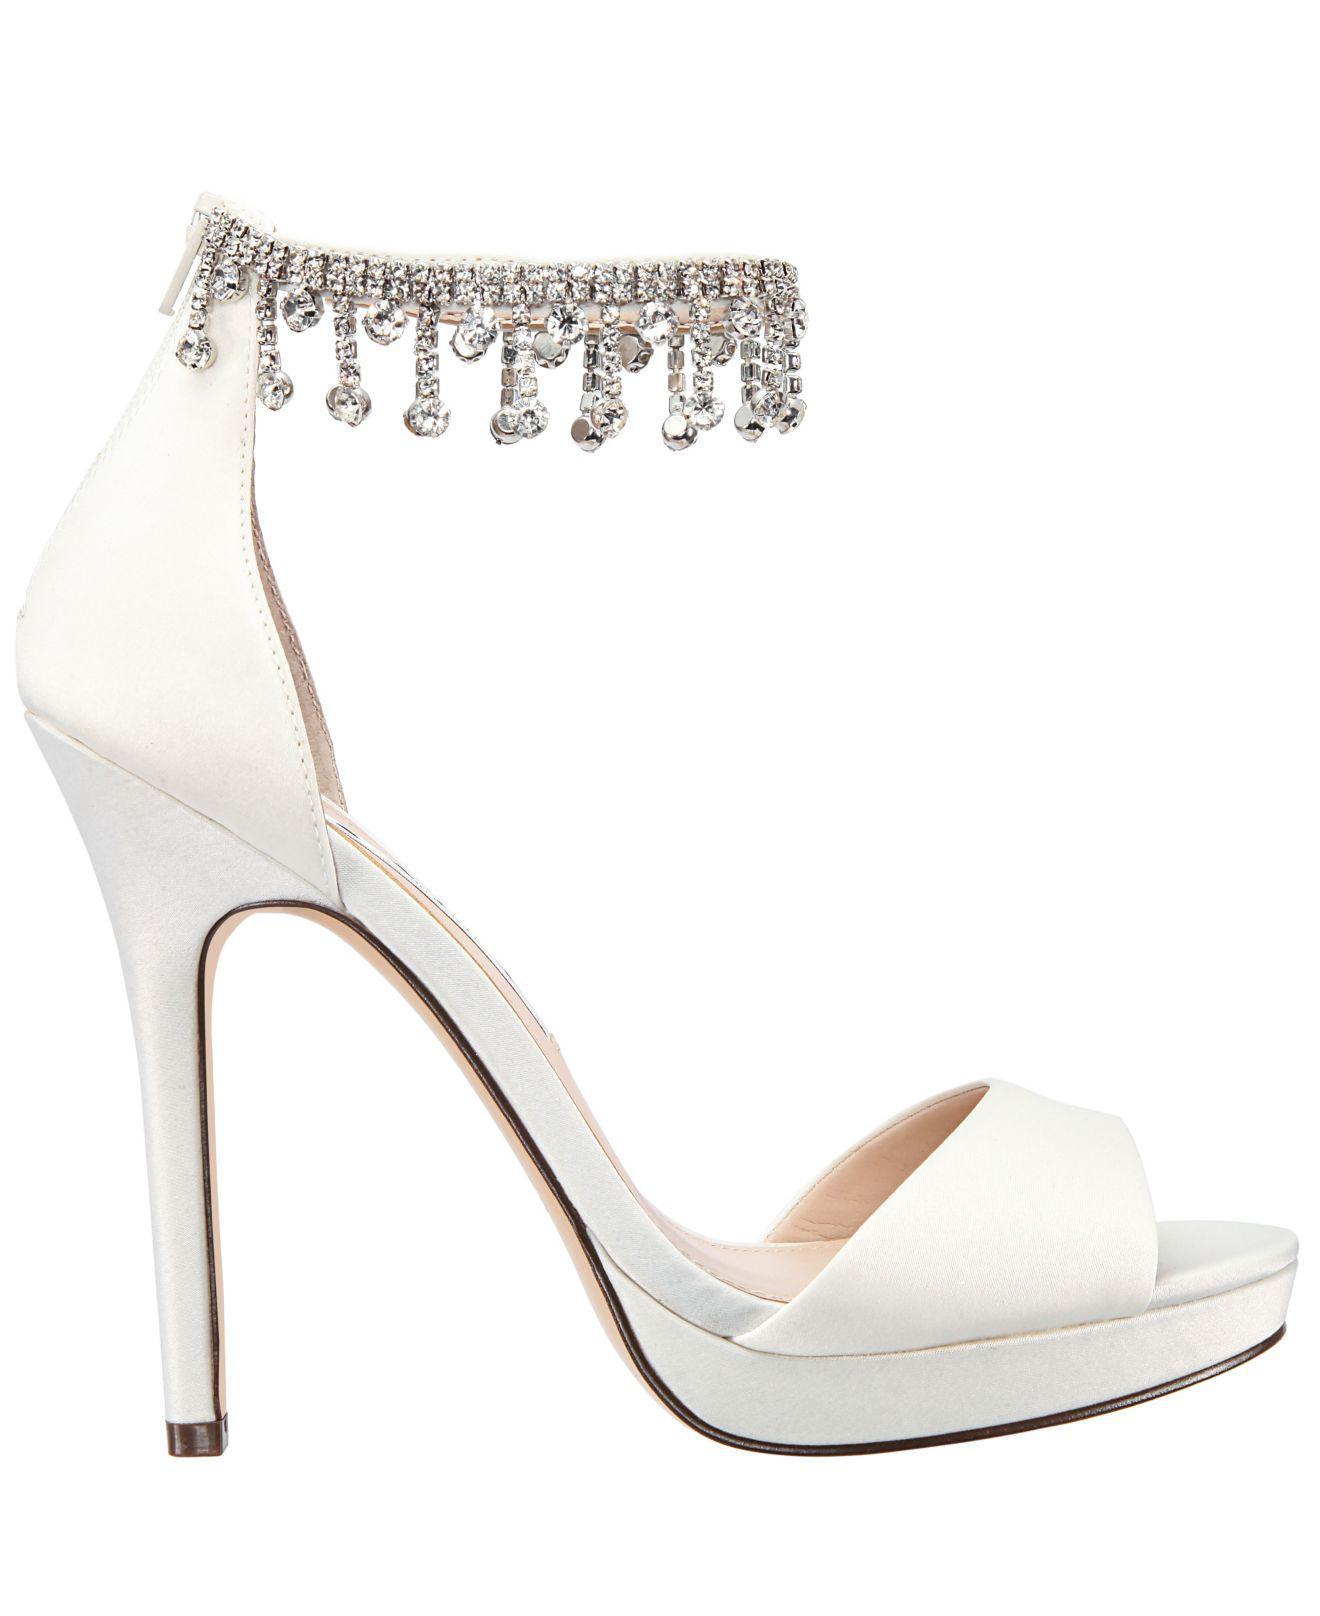 e47d86d225b Lyst - Nina Feya Platform Dress Sandals in White